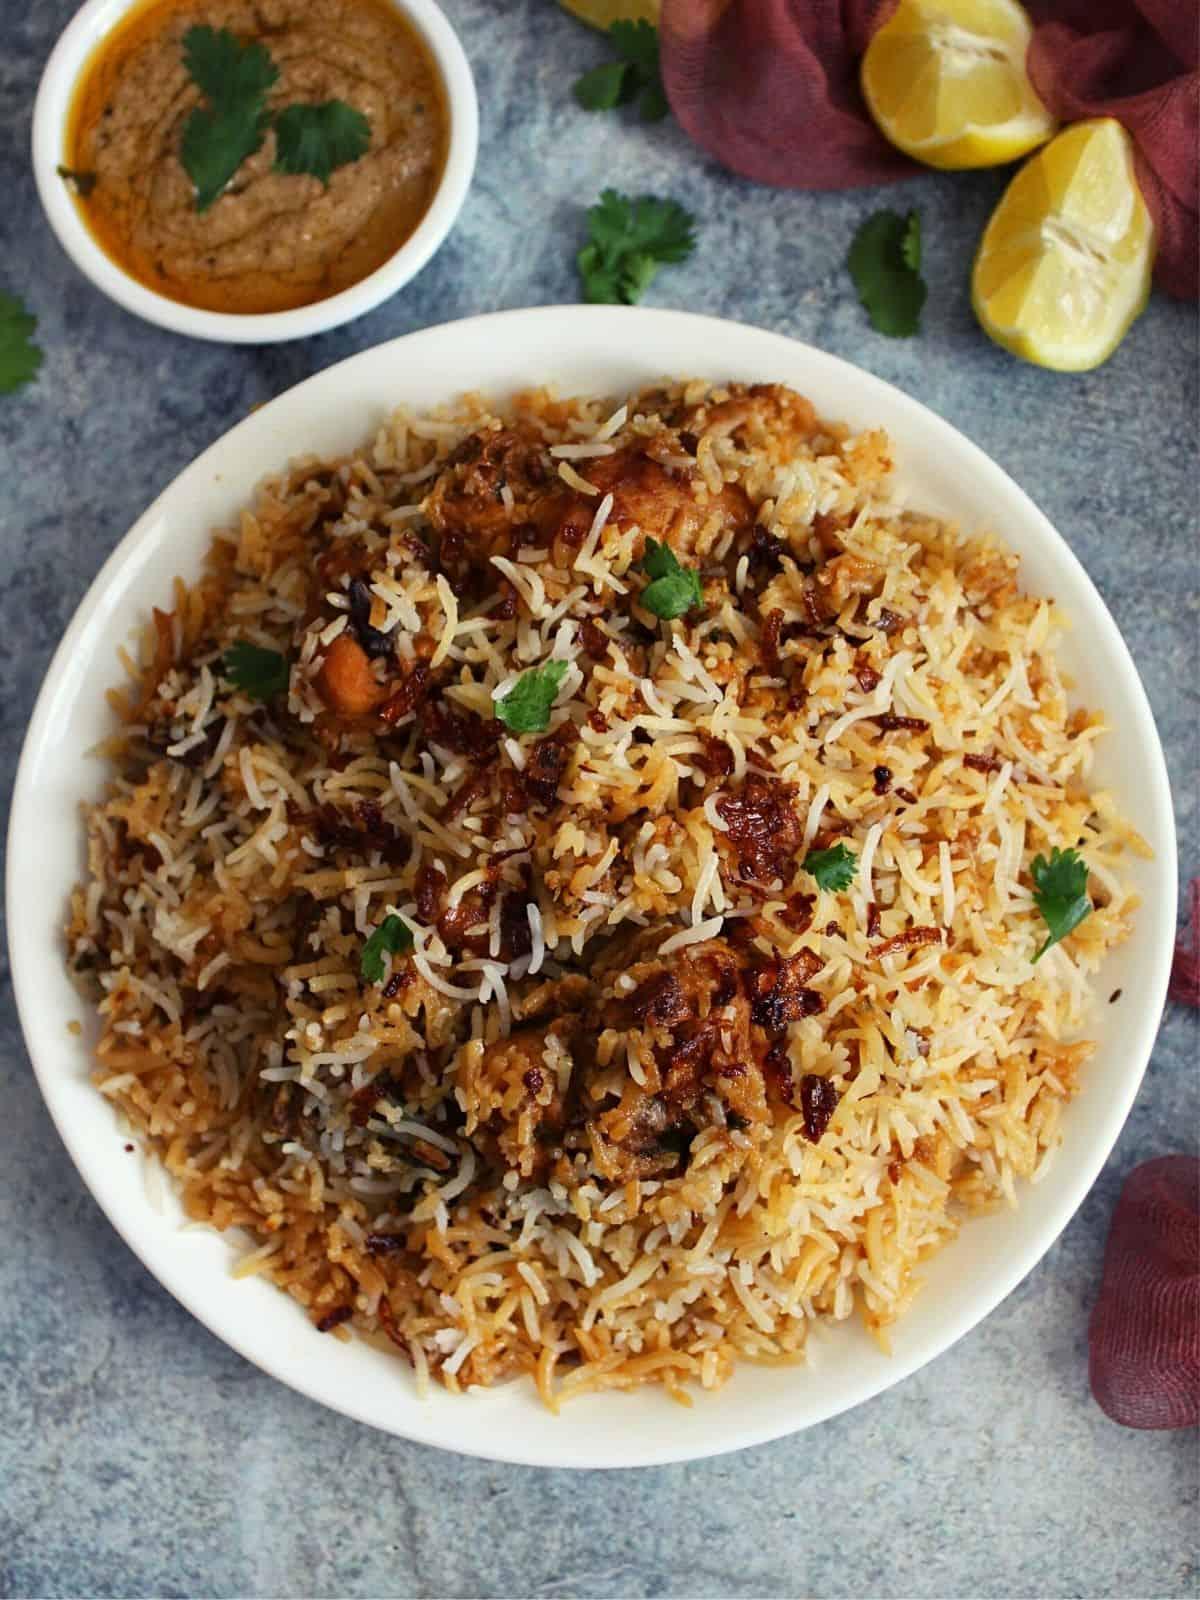 chicken dum biryani hyderabadi style on a plate with mirchi ka salan